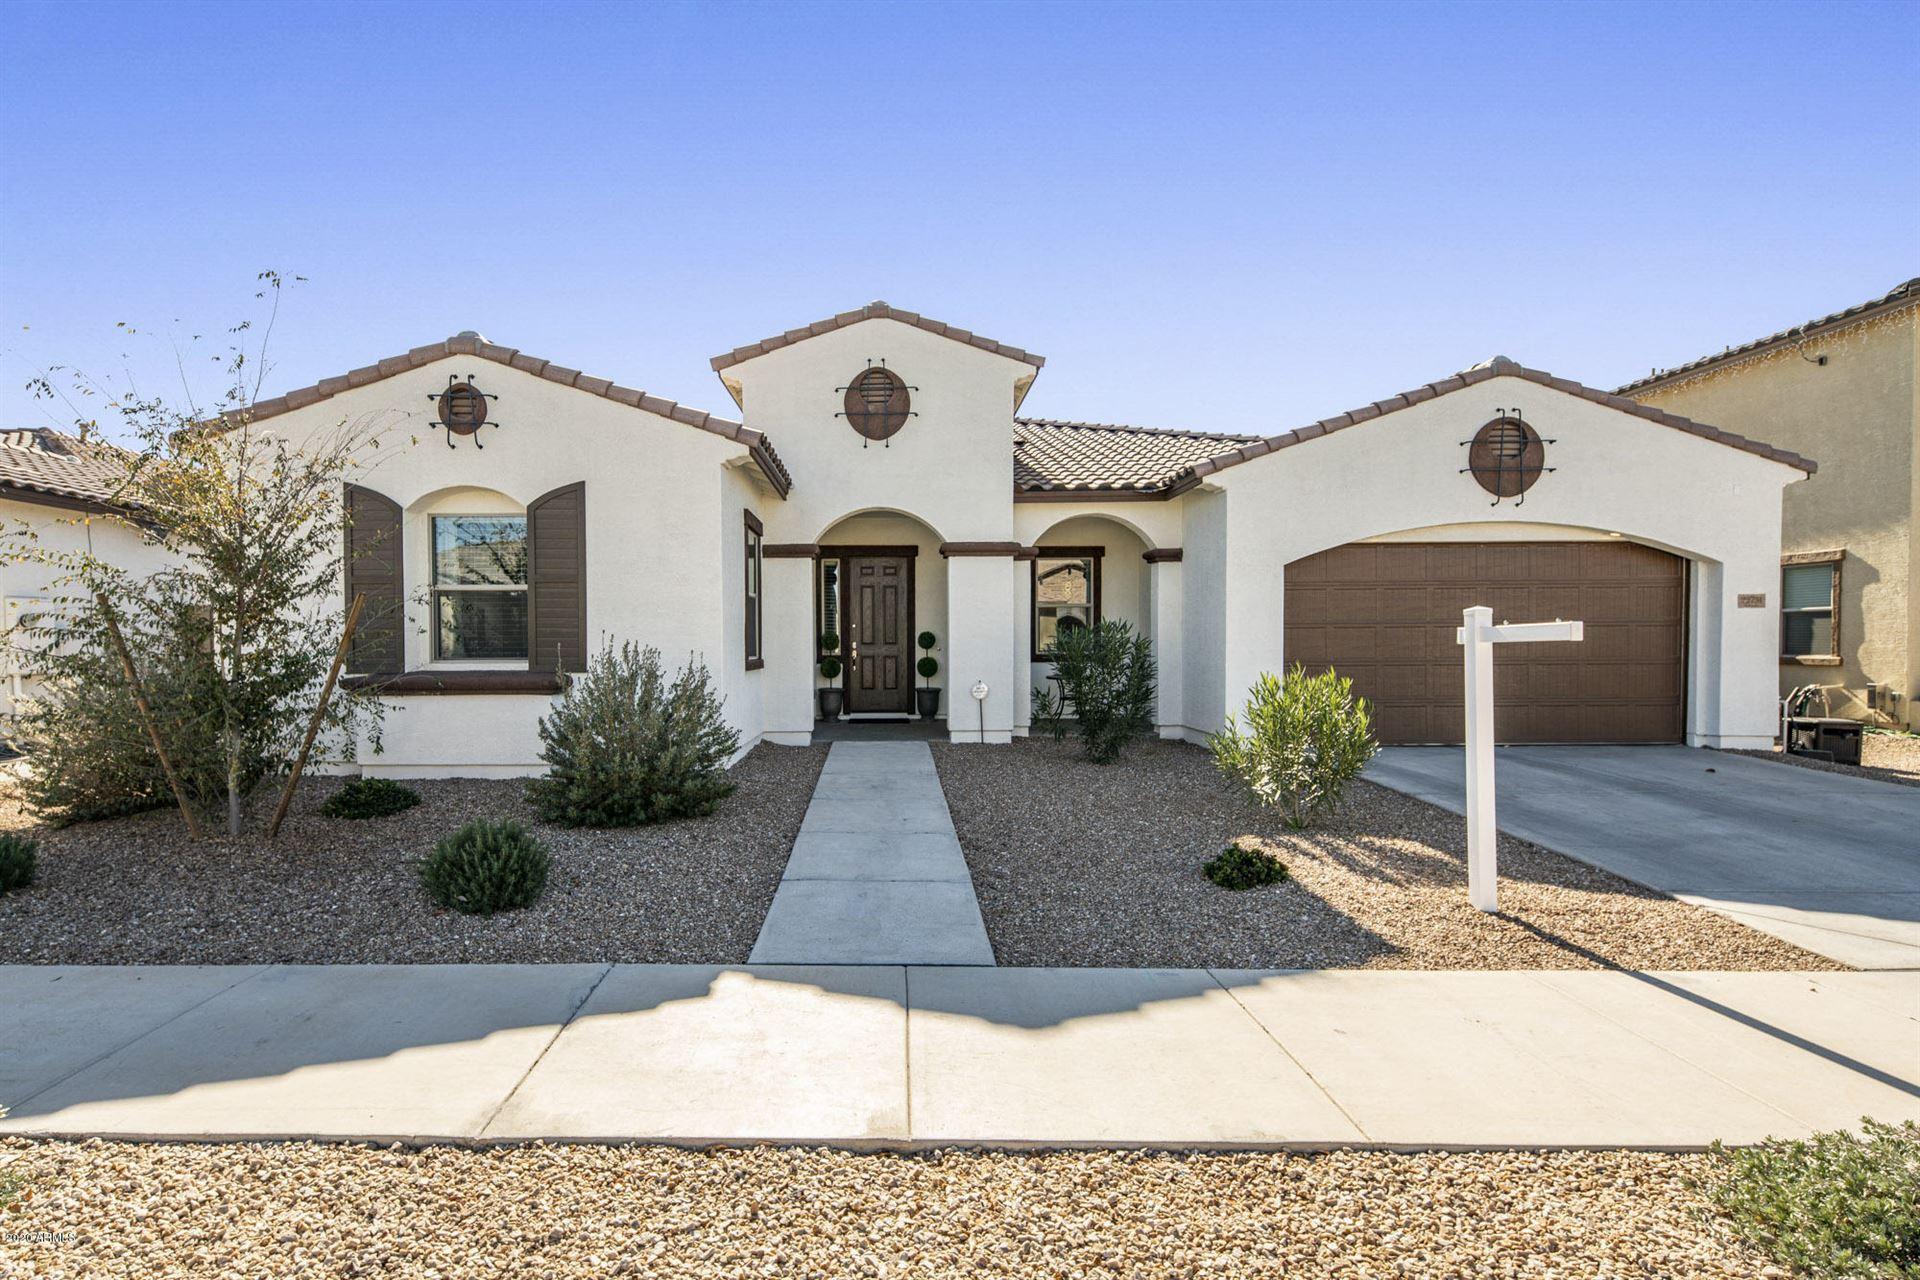 22731 E PARKSIDE Drive, Queen Creek, AZ 85142 - #: 6031103